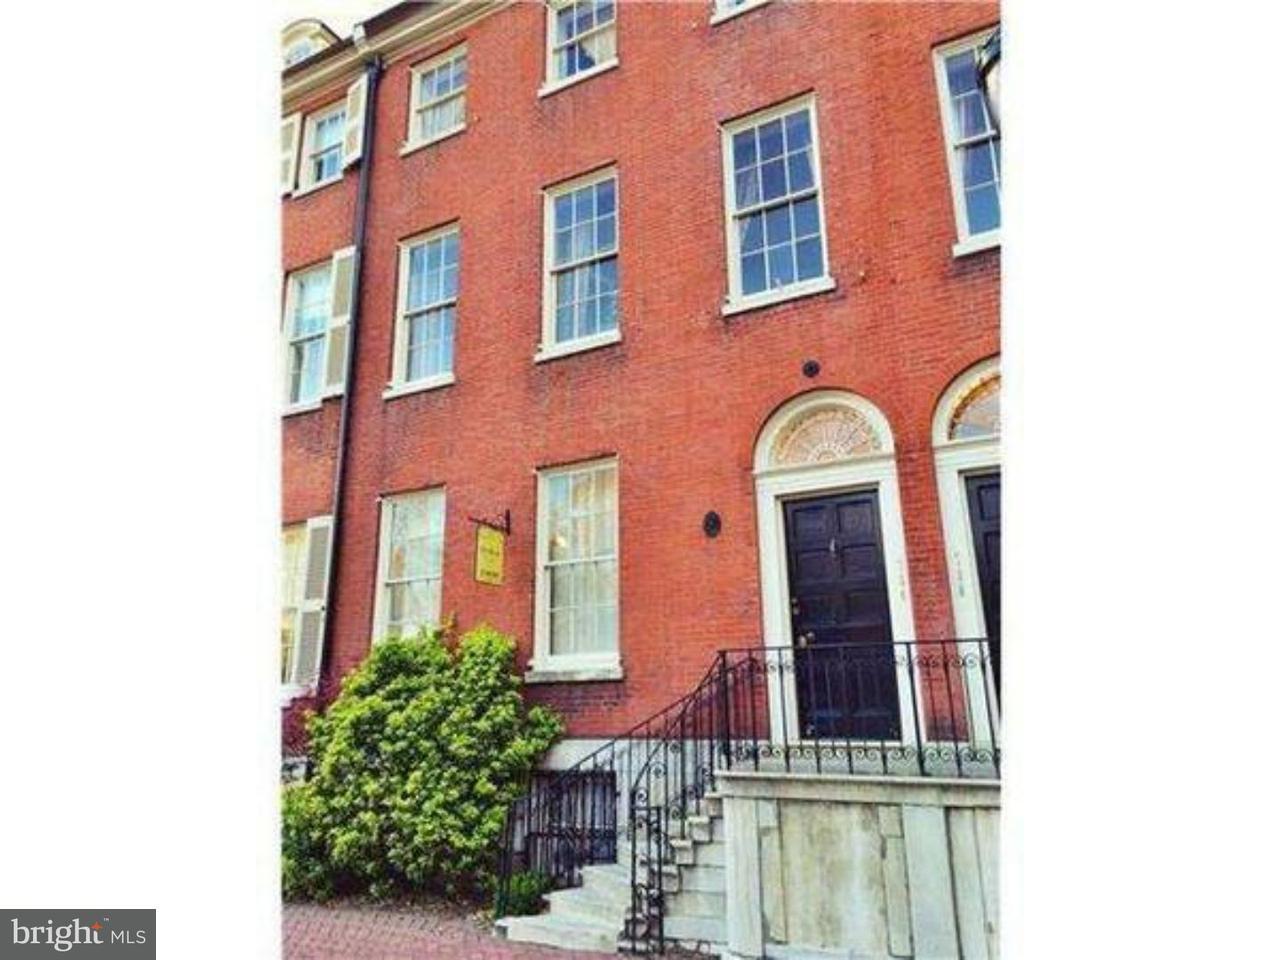 Single Family Home for Rent at 704-6 S WASHINGTON SQ #1R Philadelphia, Pennsylvania 19106 United States